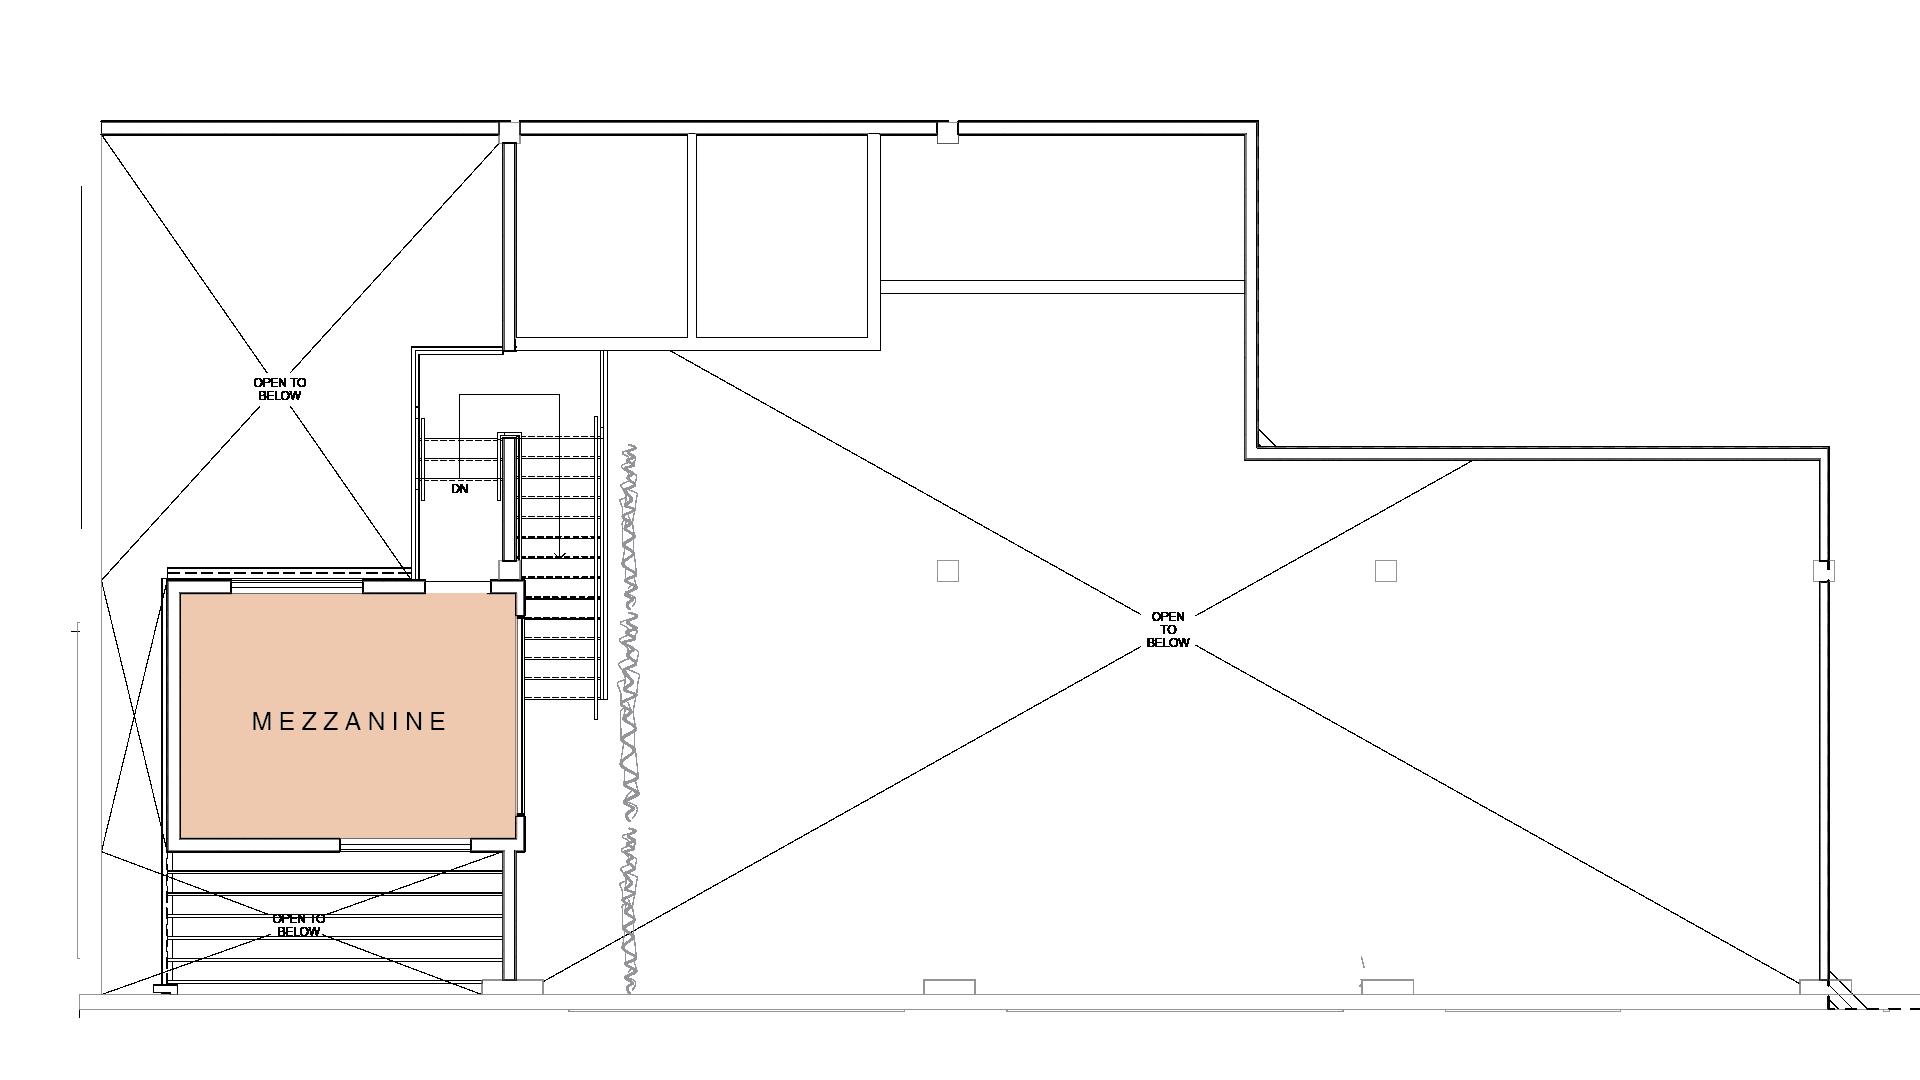 rlm_layout_mezzanine.png